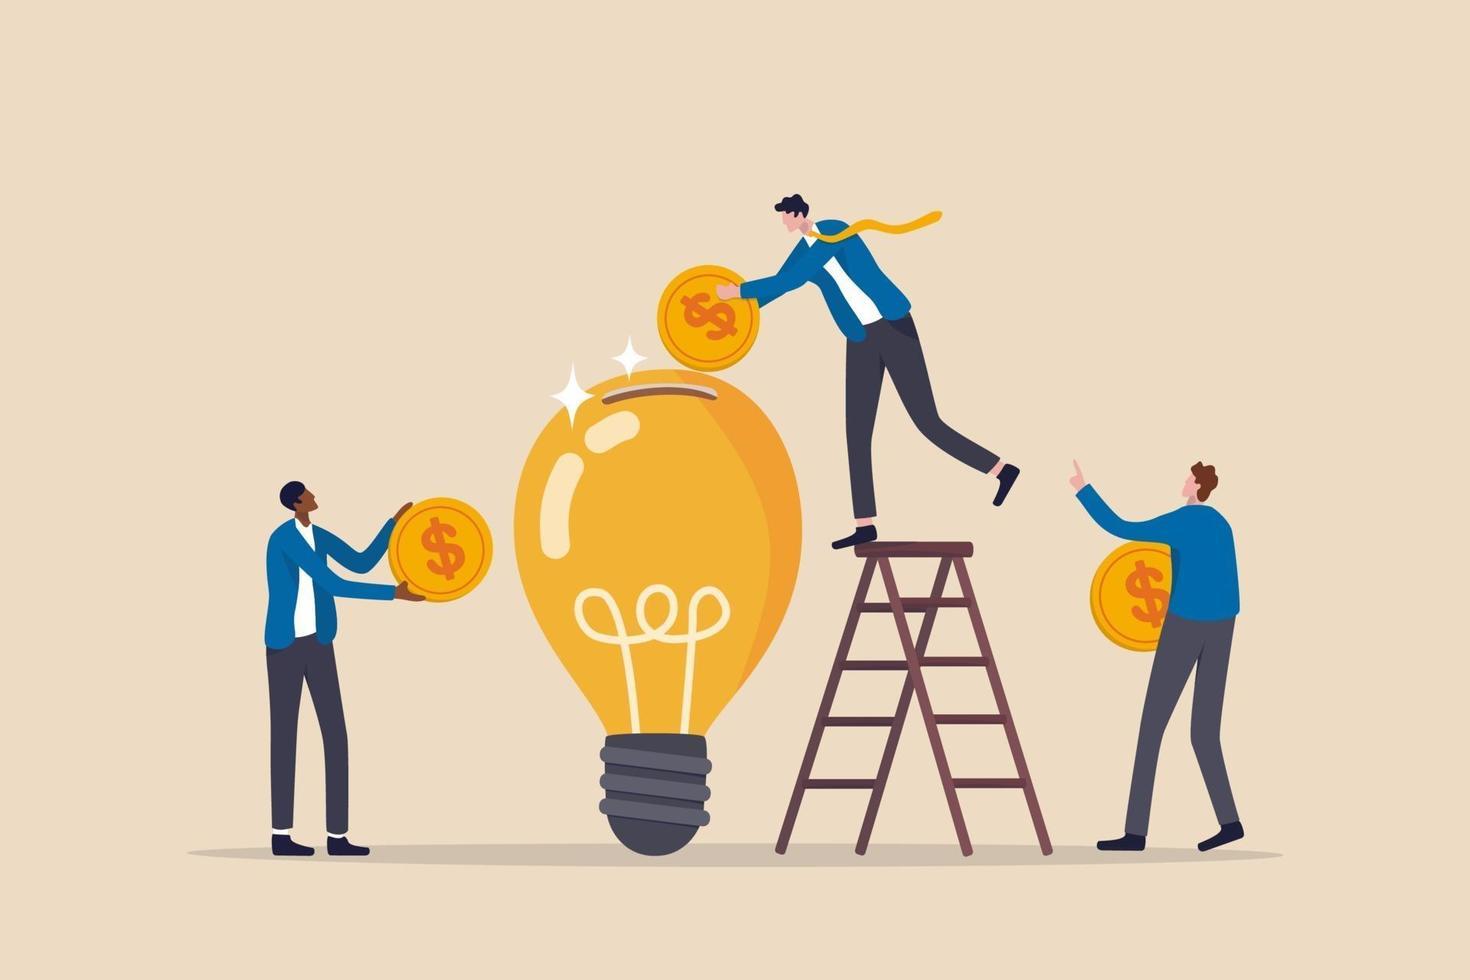 Fundraising idea, funding new innovative project, donation vector